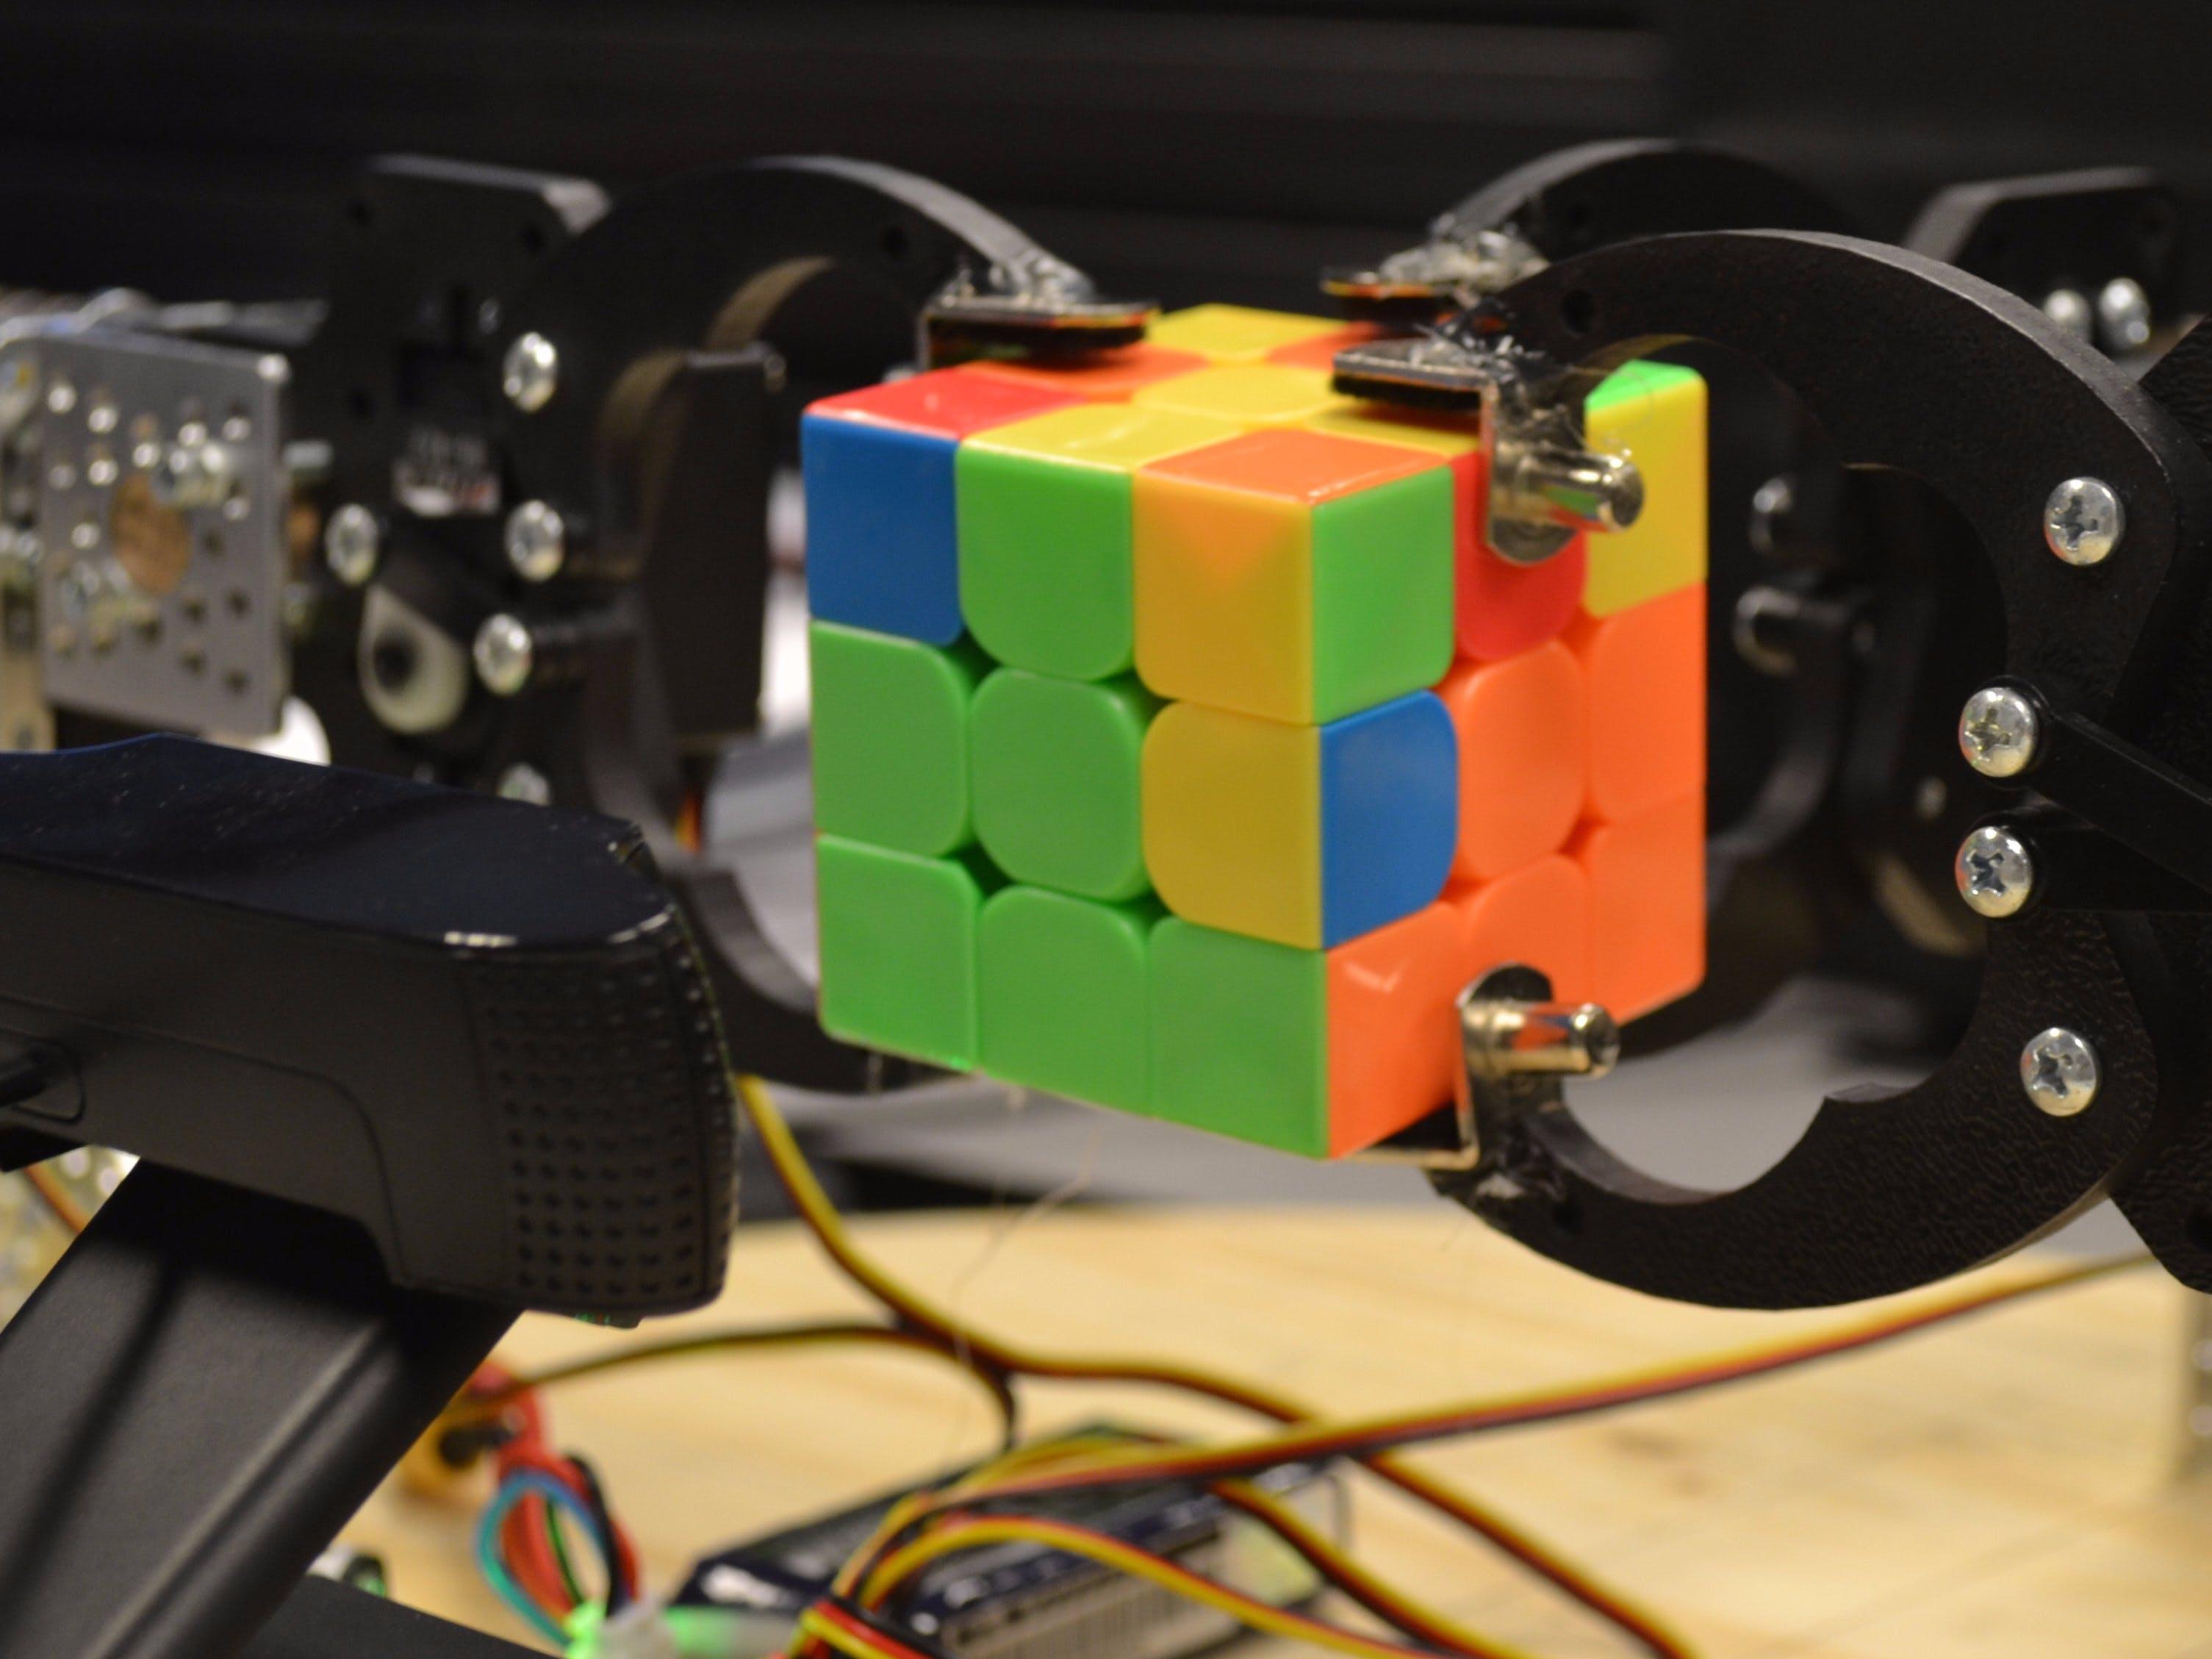 Robotics w/ OSD335x-Powered BeagleBone Blue: Rubik's Solver